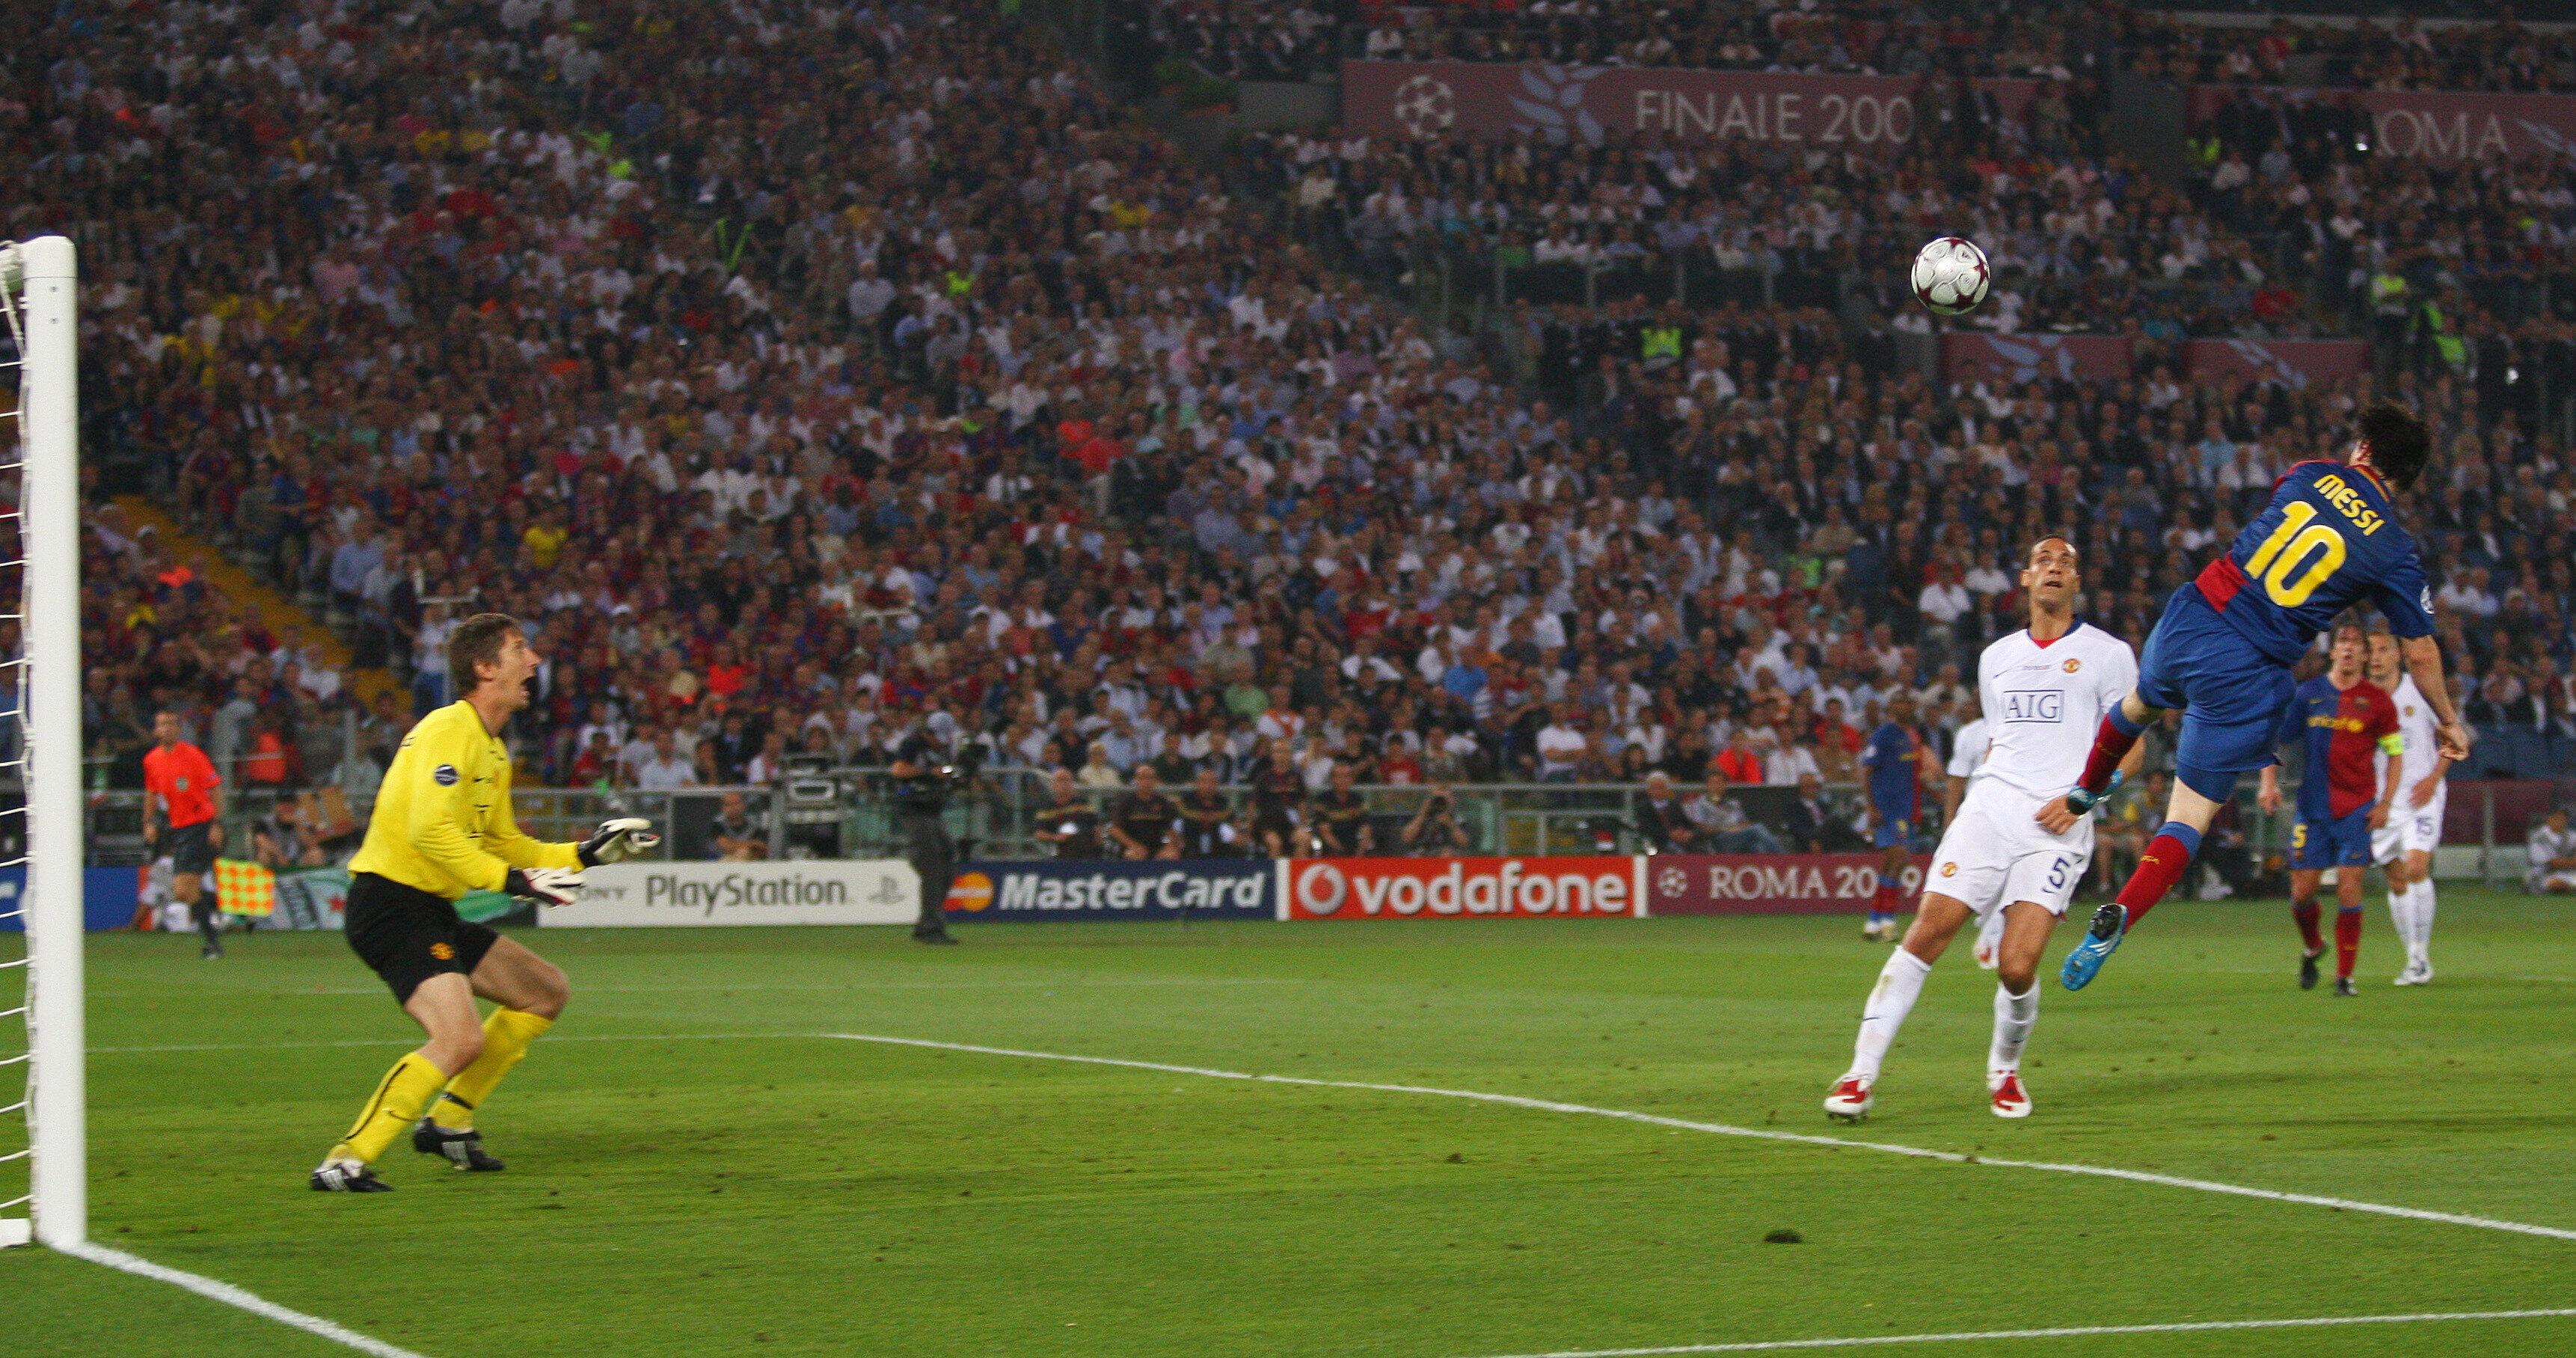 Lionel Messi'nin Manchester United'a attığı kafa golü.